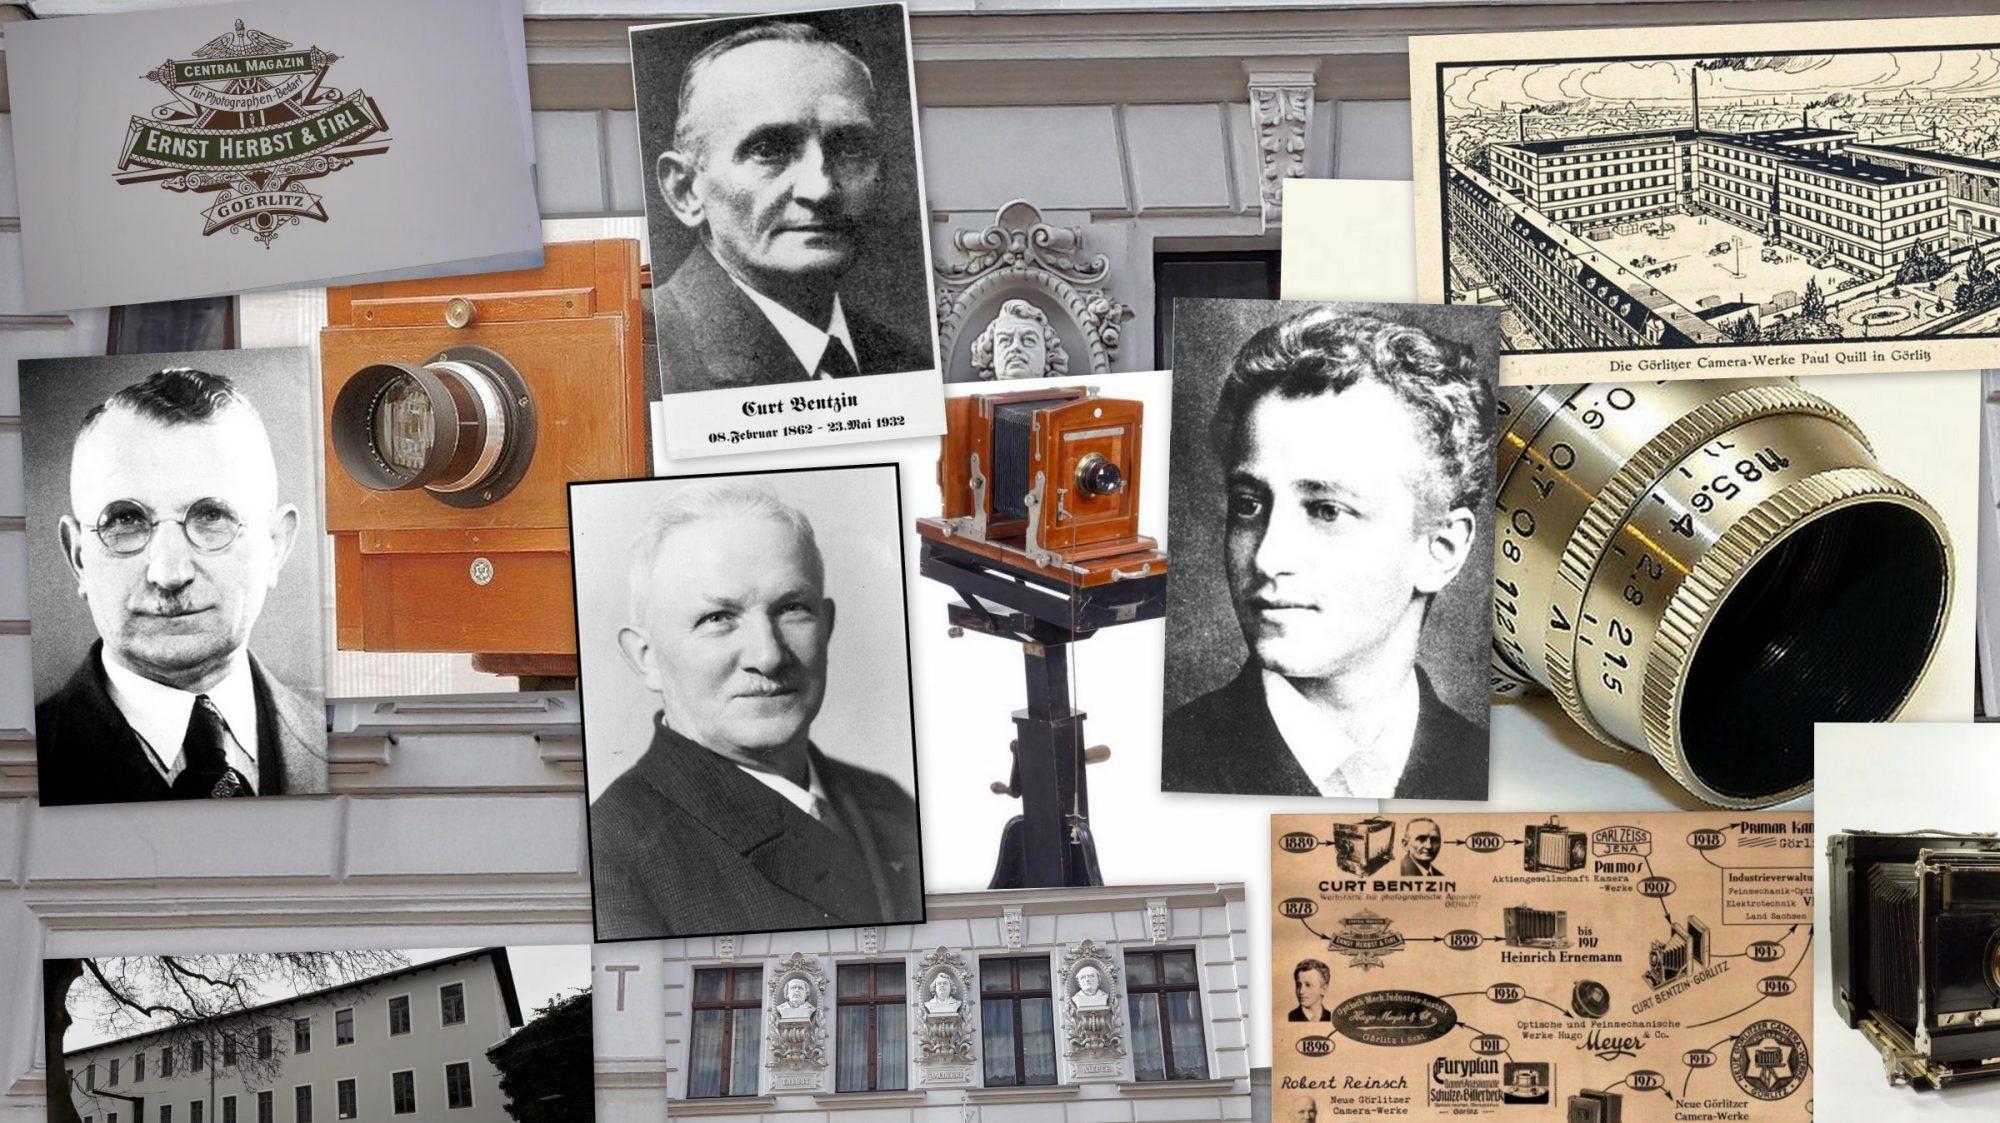 Geschichte der Fotoindustrie in Görlitz